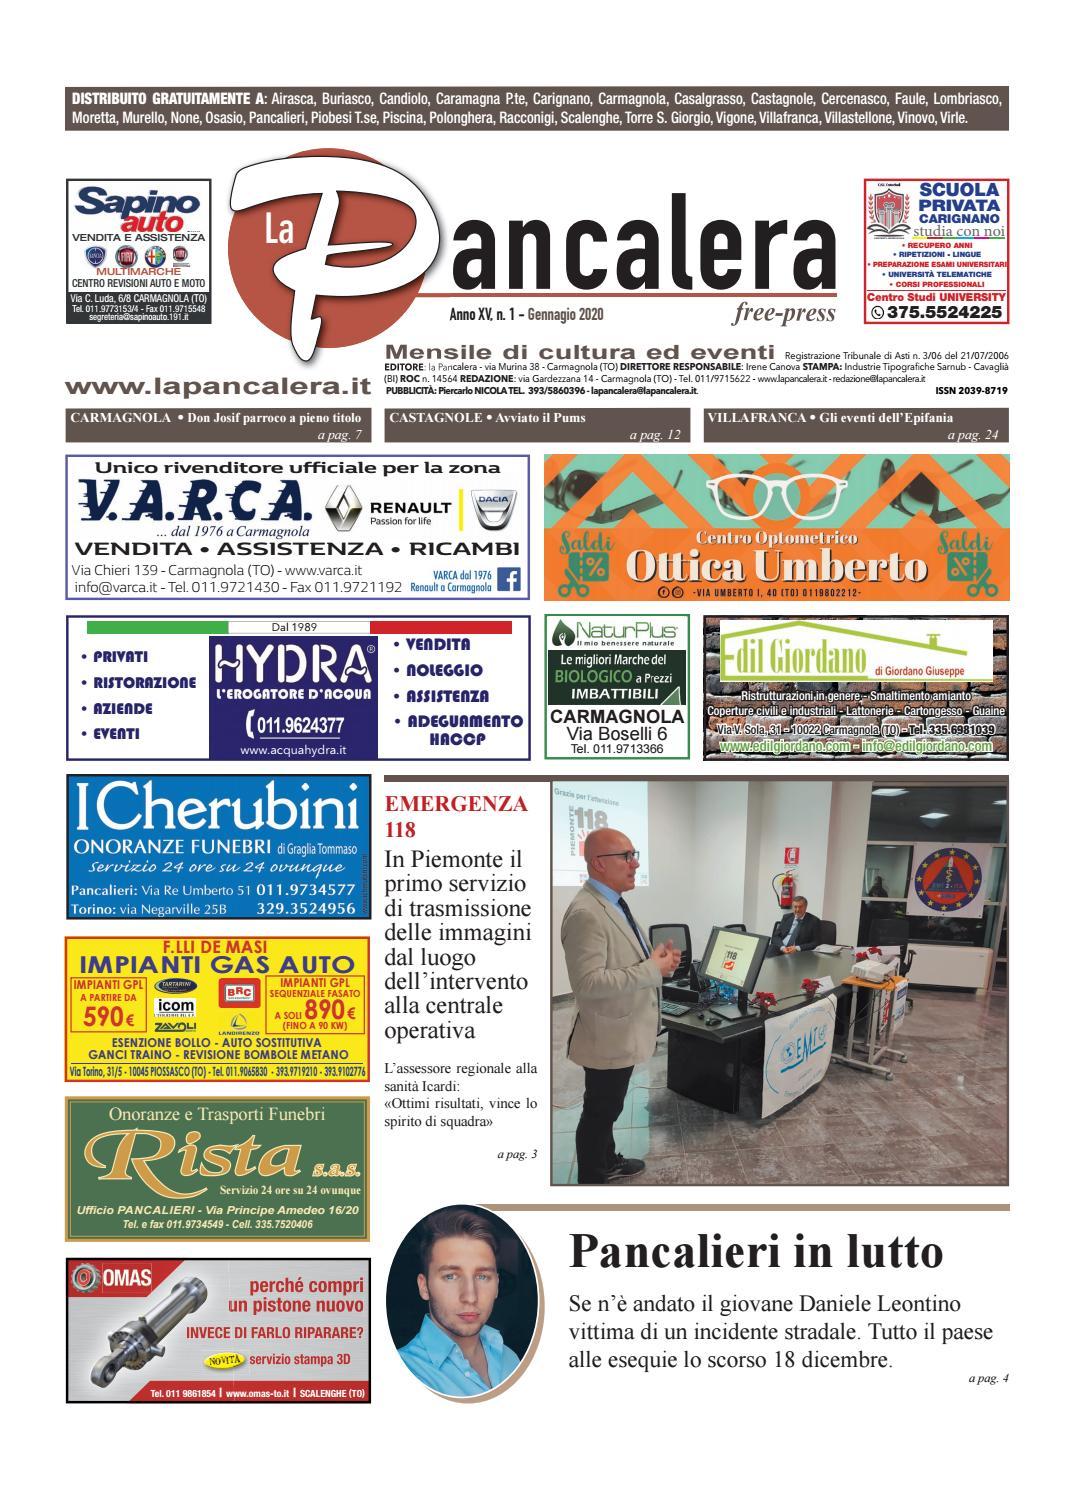 Centro Del Materasso Carmagnola.La Pancalera Gennaio 2020 By La Pancalera Issuu